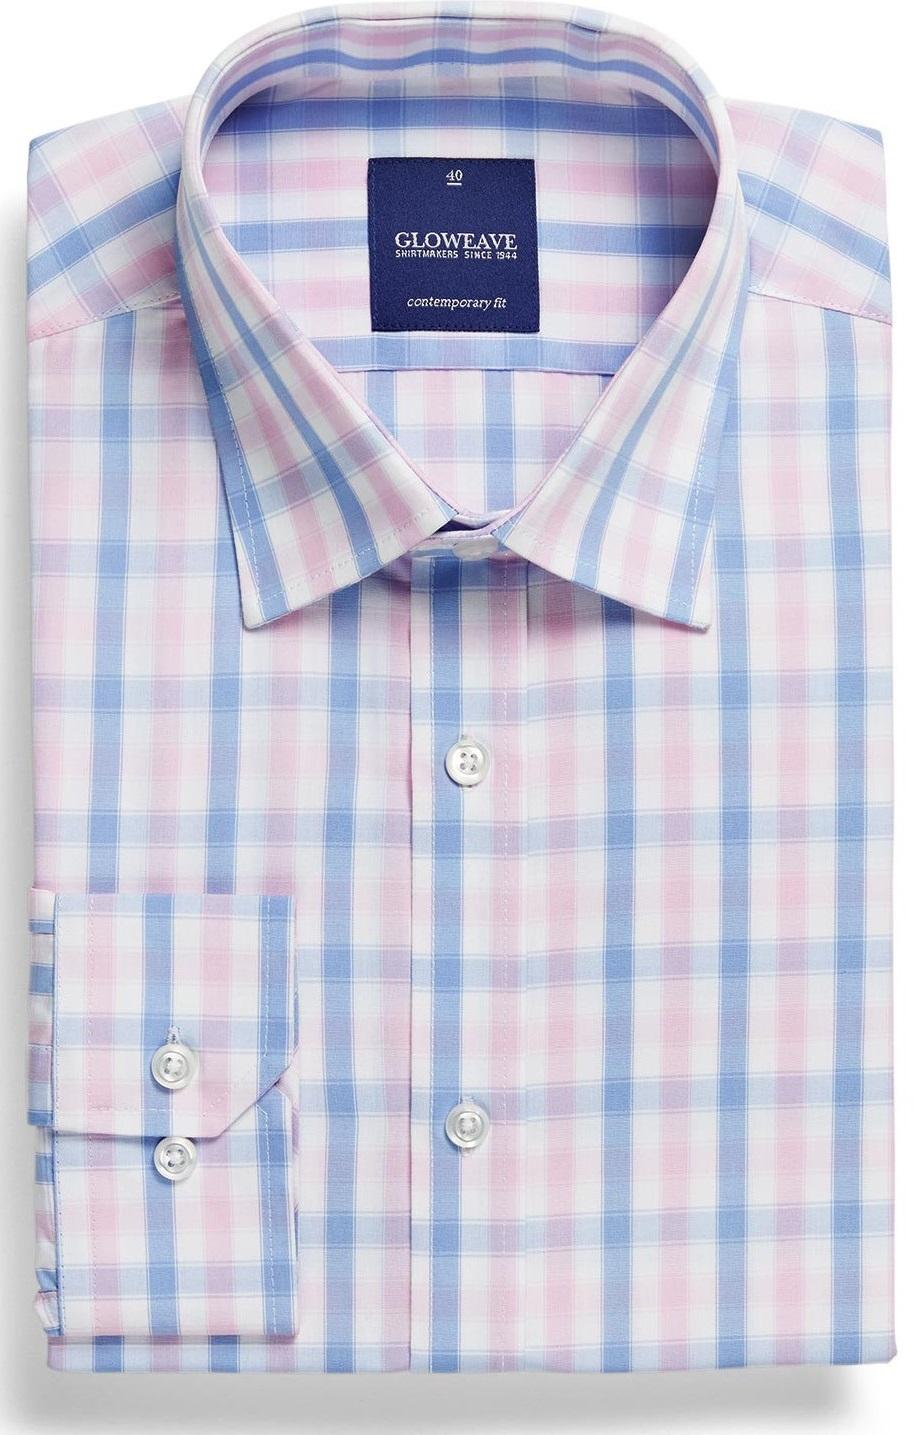 Gloweave Shirt